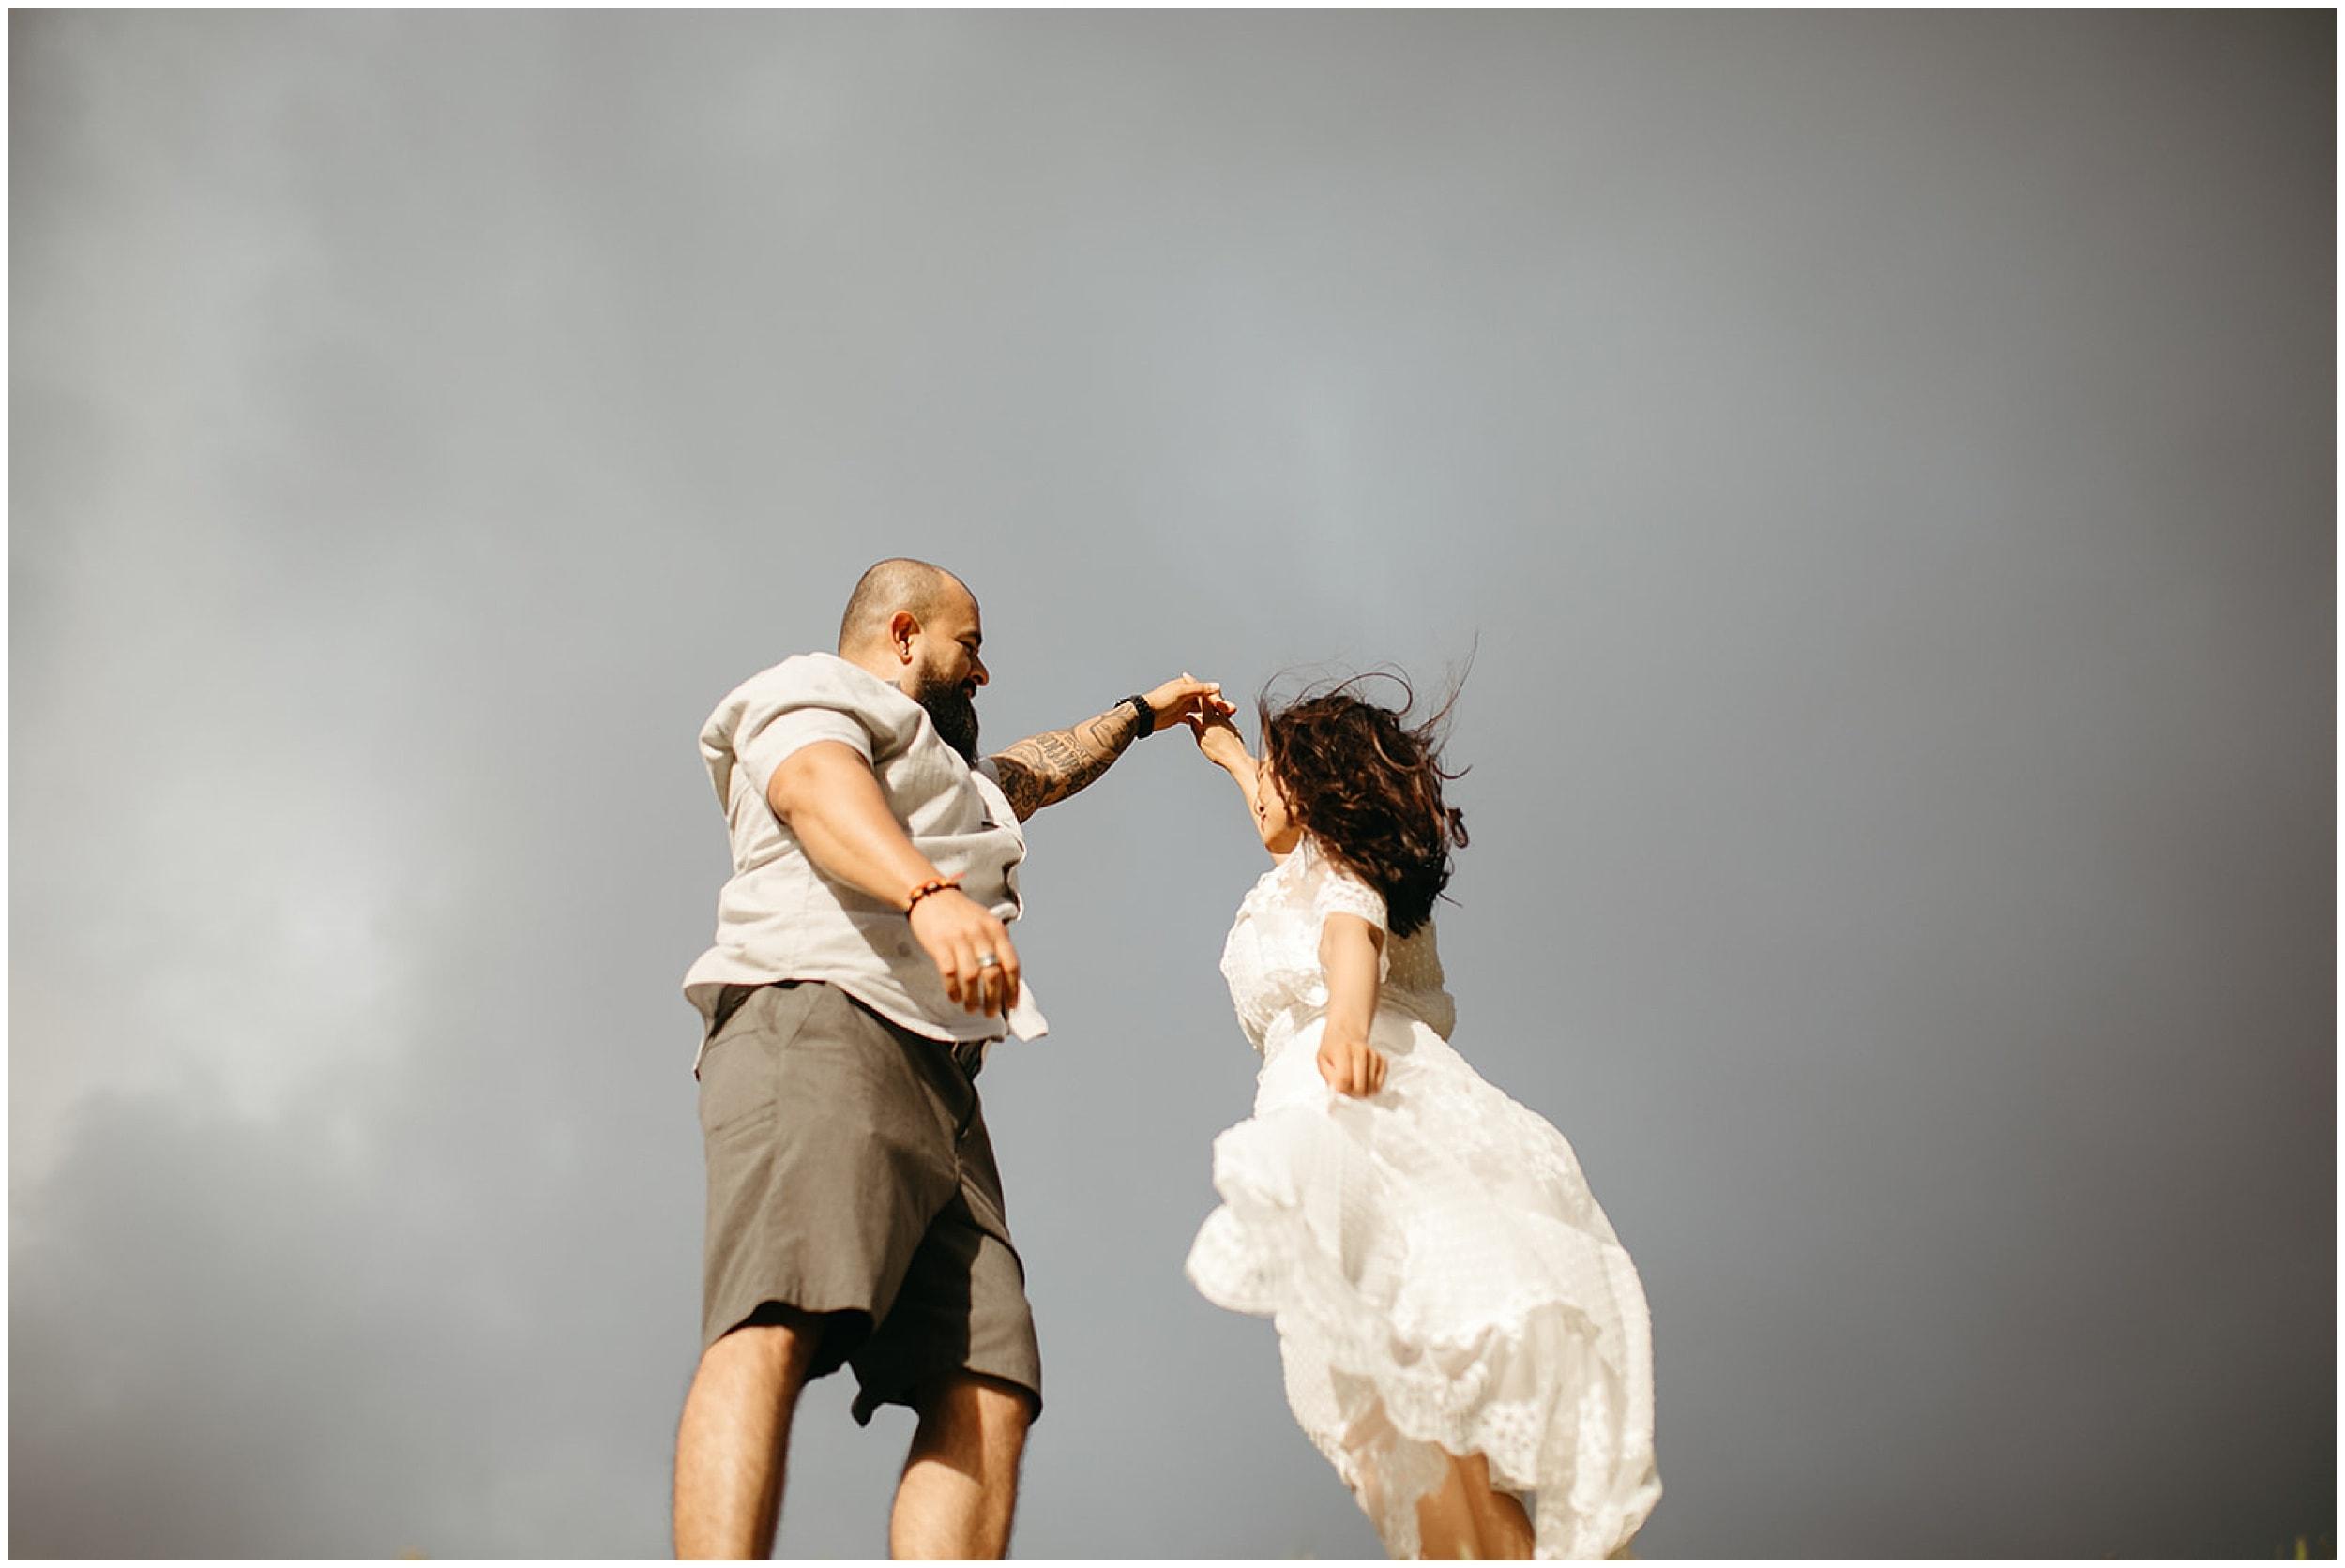 man twirling woman